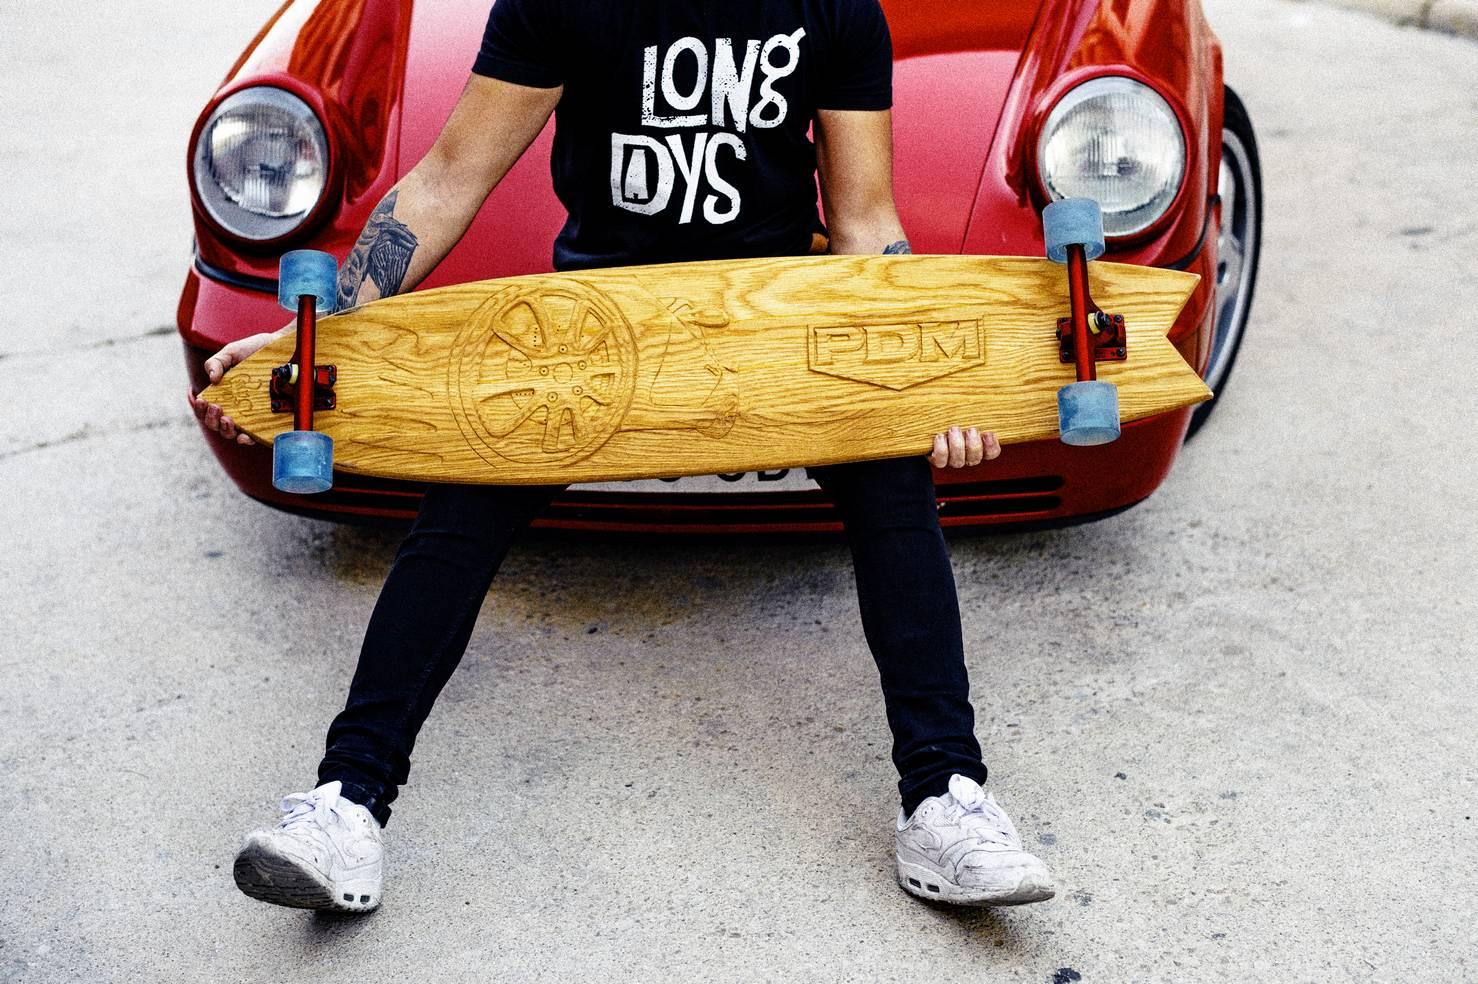 PDM Murcia/Club Porsche/Long Days/Longboard